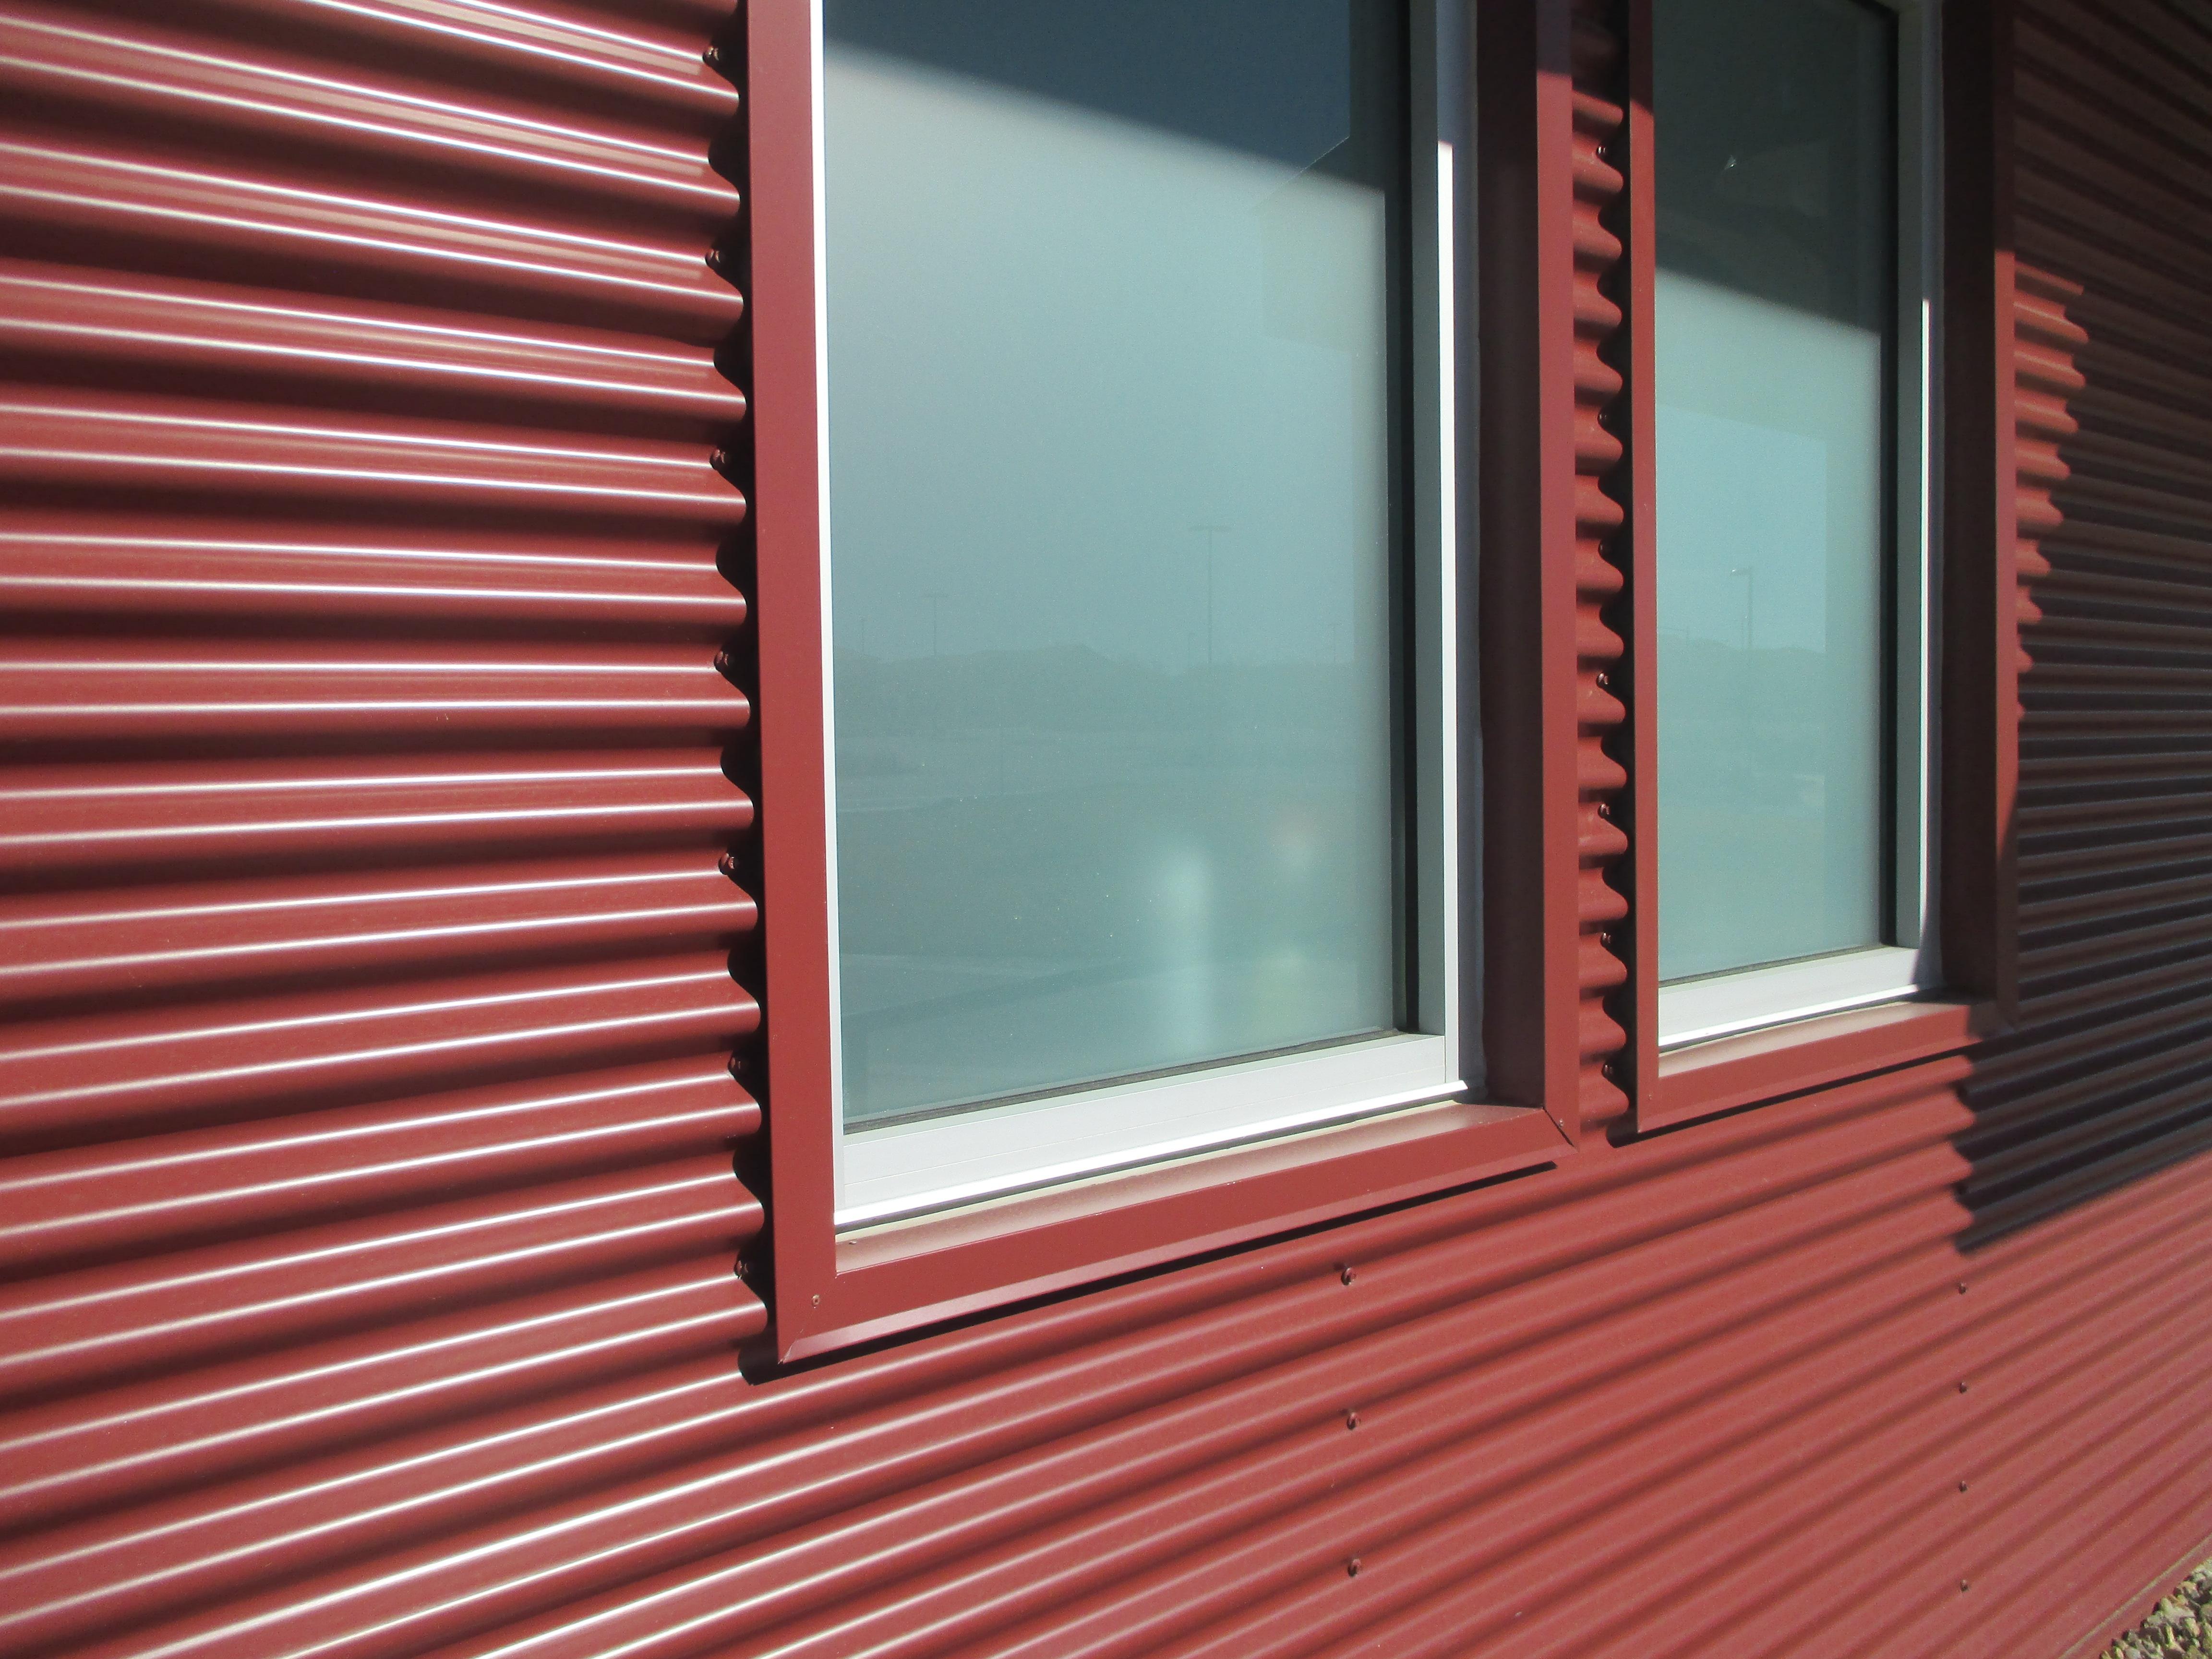 Residential Metal Wall Paneling